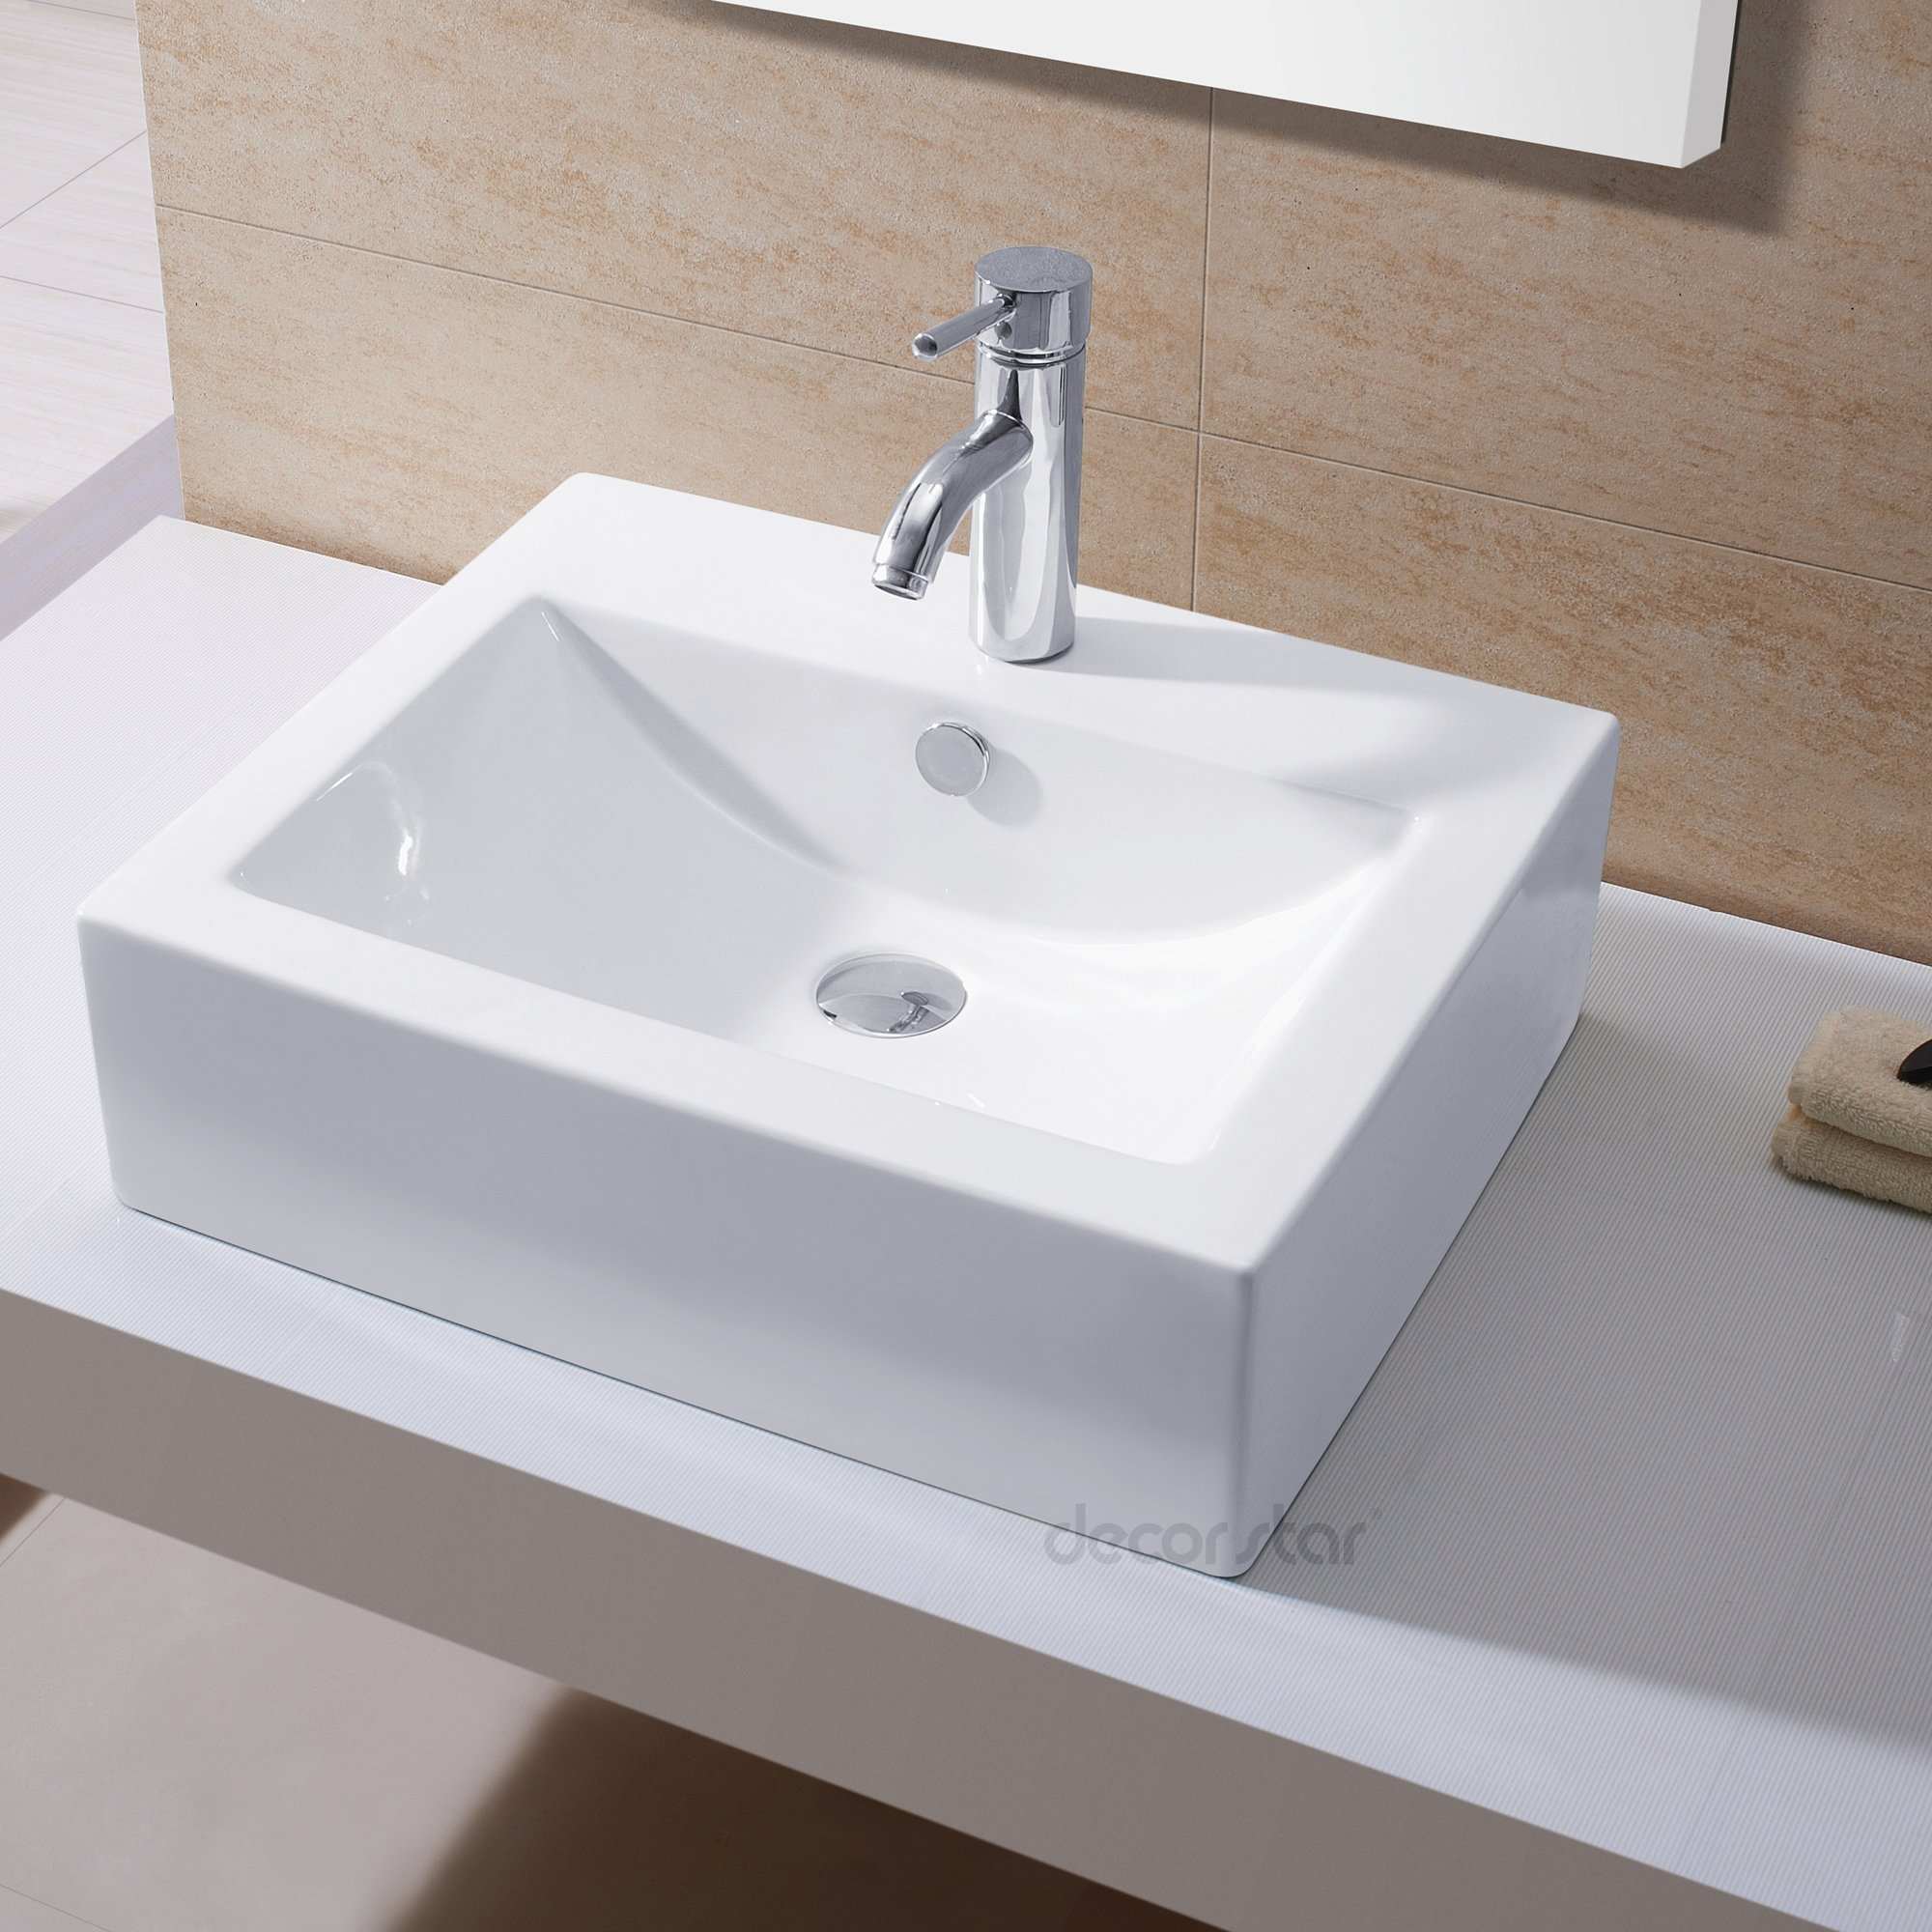 Decor Star CB-003 Bathroom Porcelain Ceramic Vessel Vanity Sink Art Basin